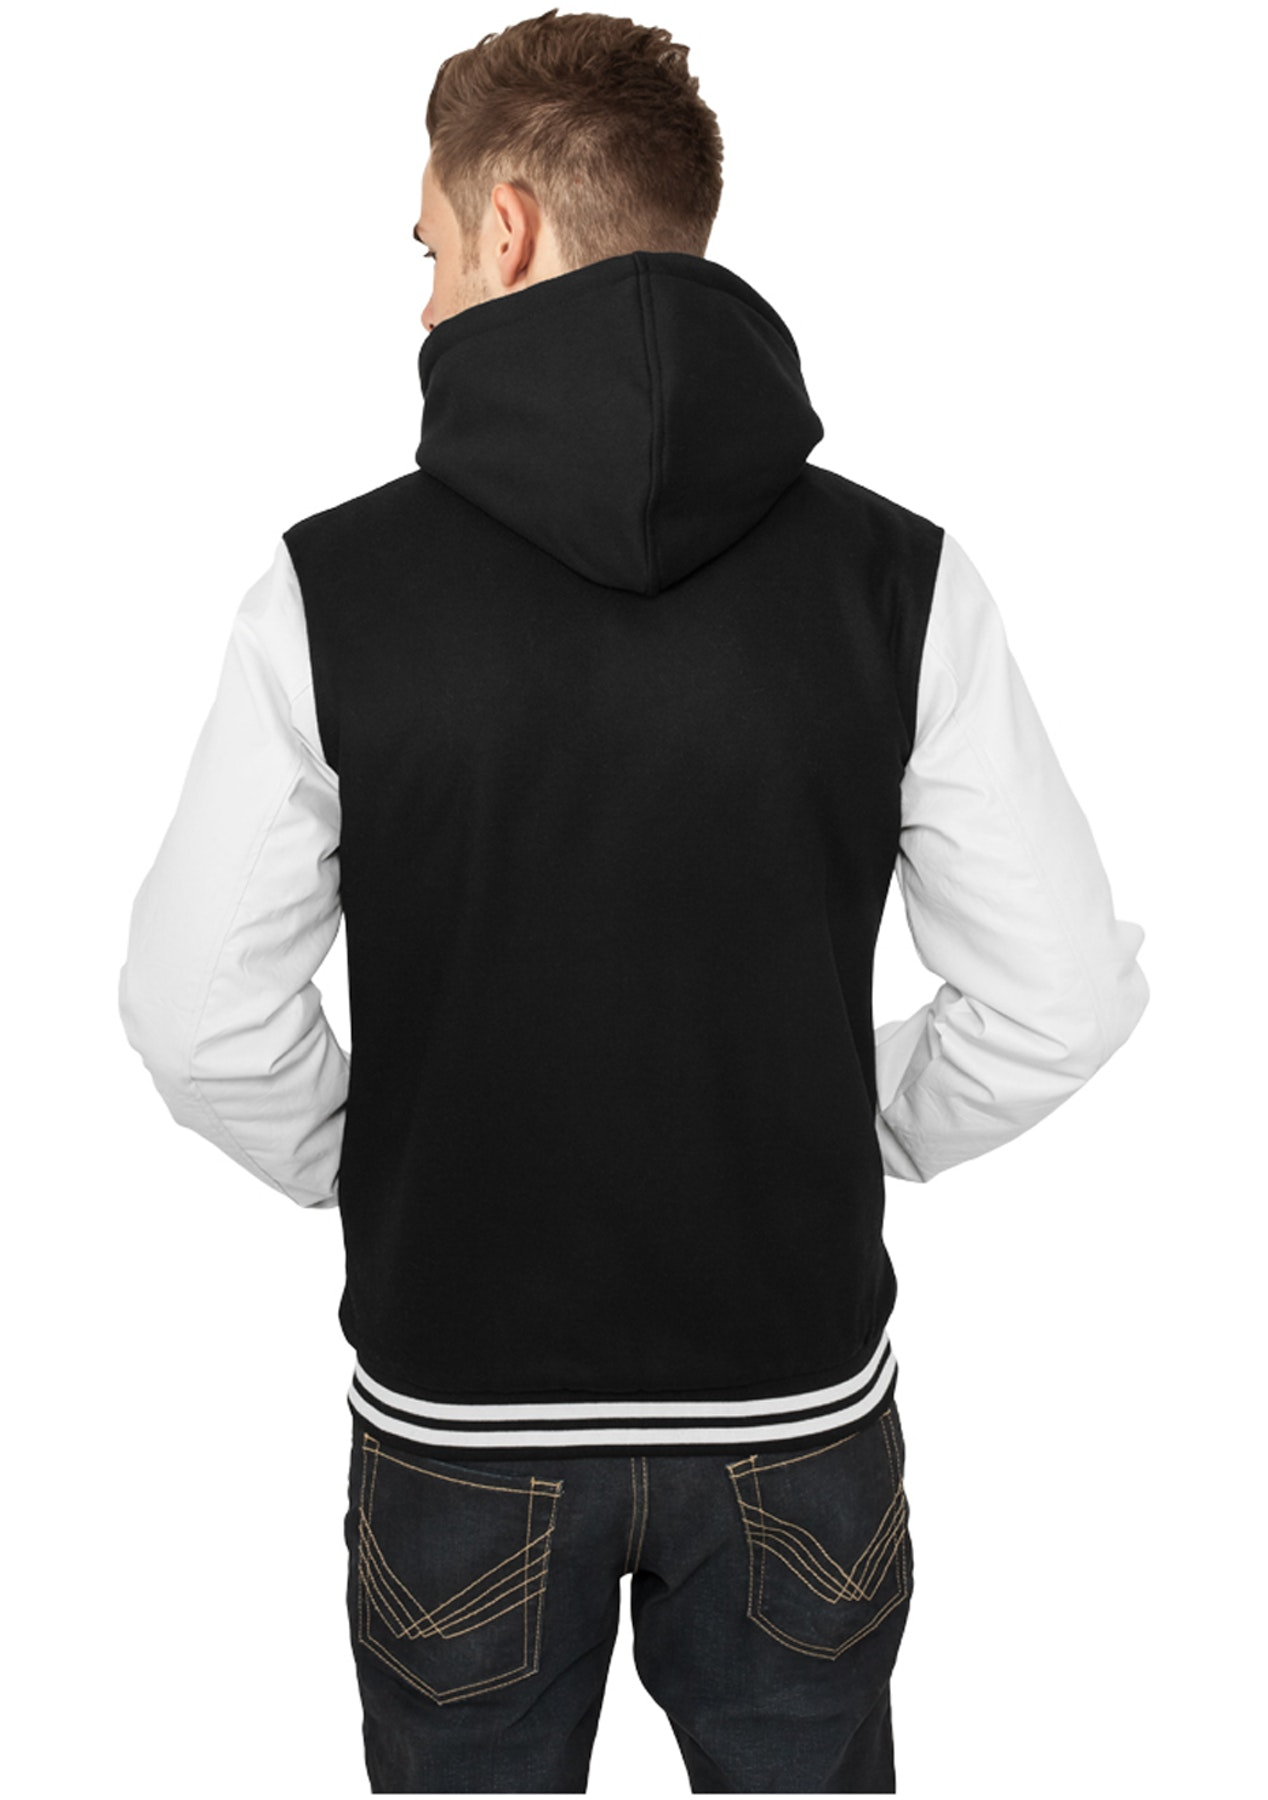 9fdc596c Urban Classics - Hooded Oldschool College Jacket - black/white ...